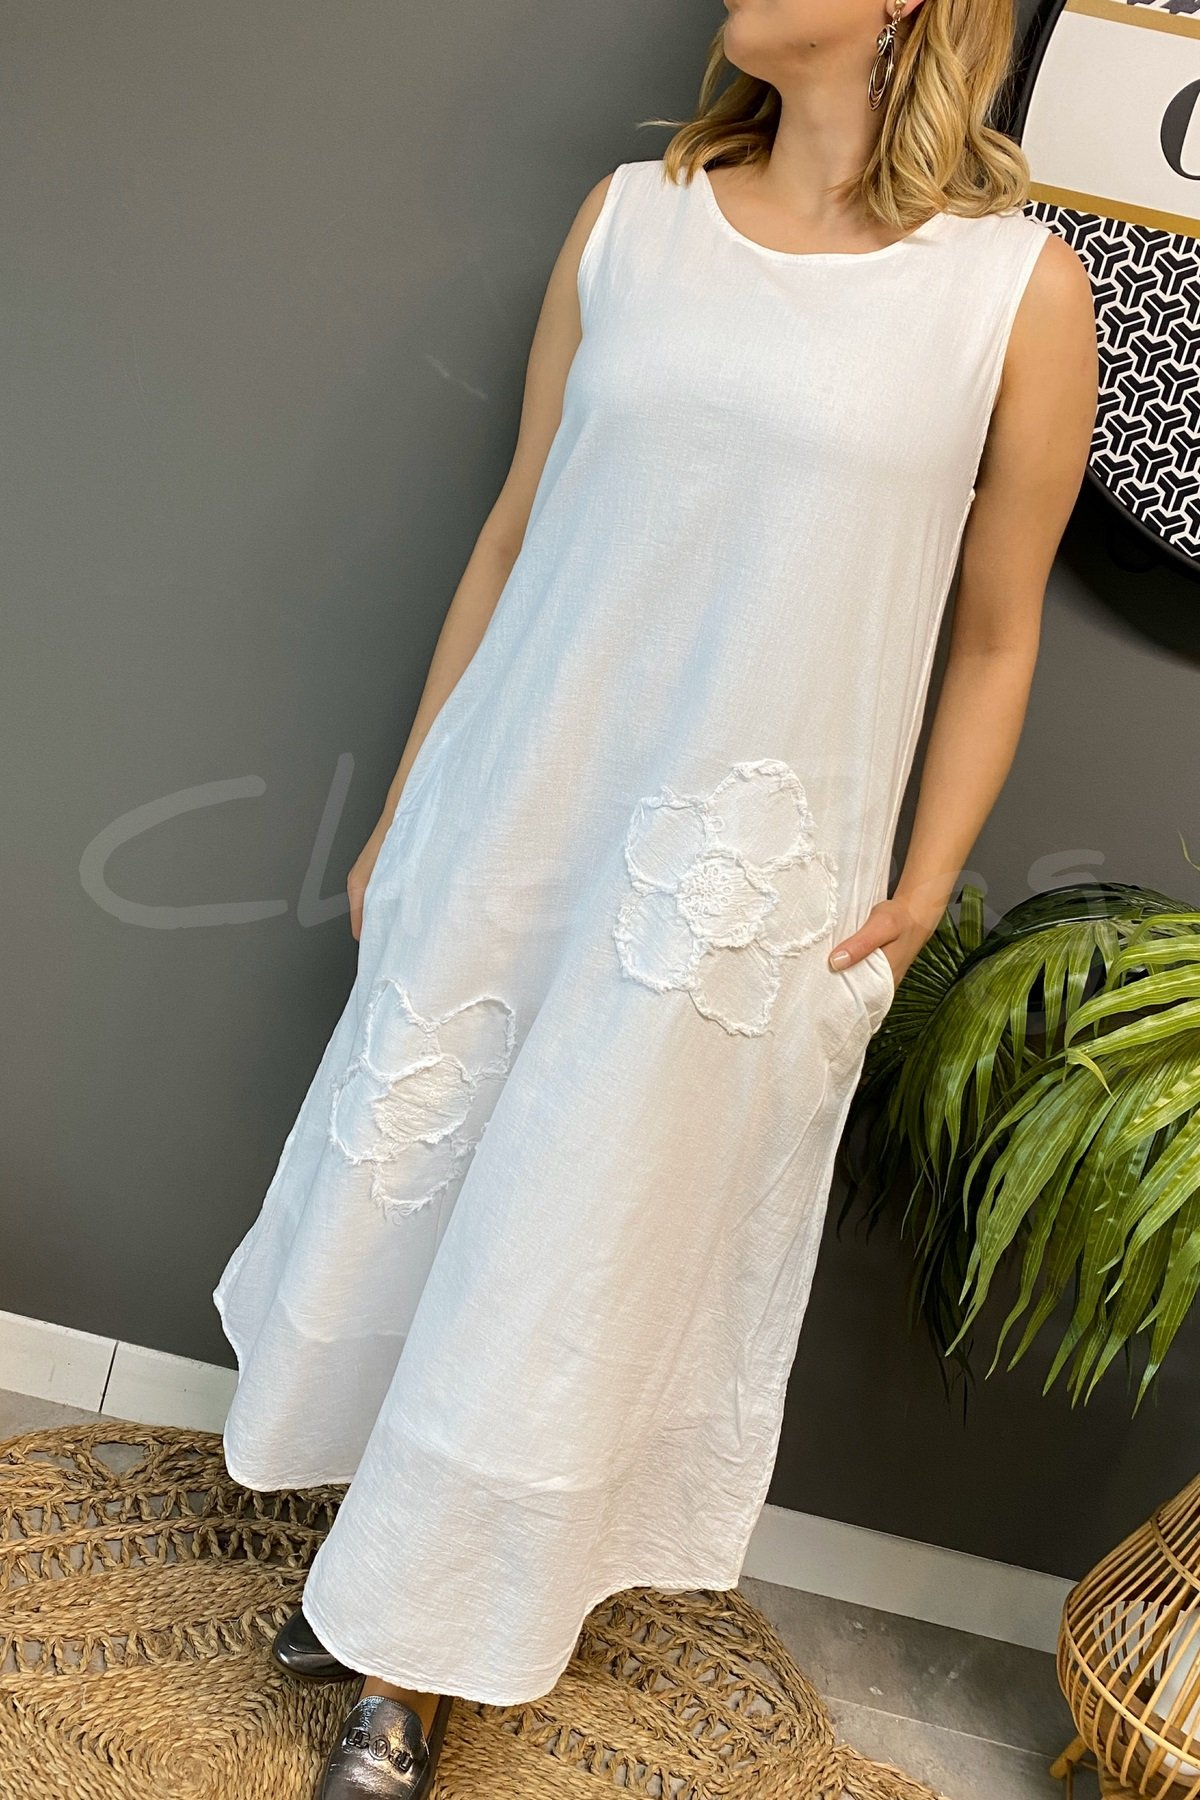 https://resim.chicbag.com.tr/p000757/byz/papatyali-kolsuz-etegi-oval-elbise-mltm-01e08247a0ee.